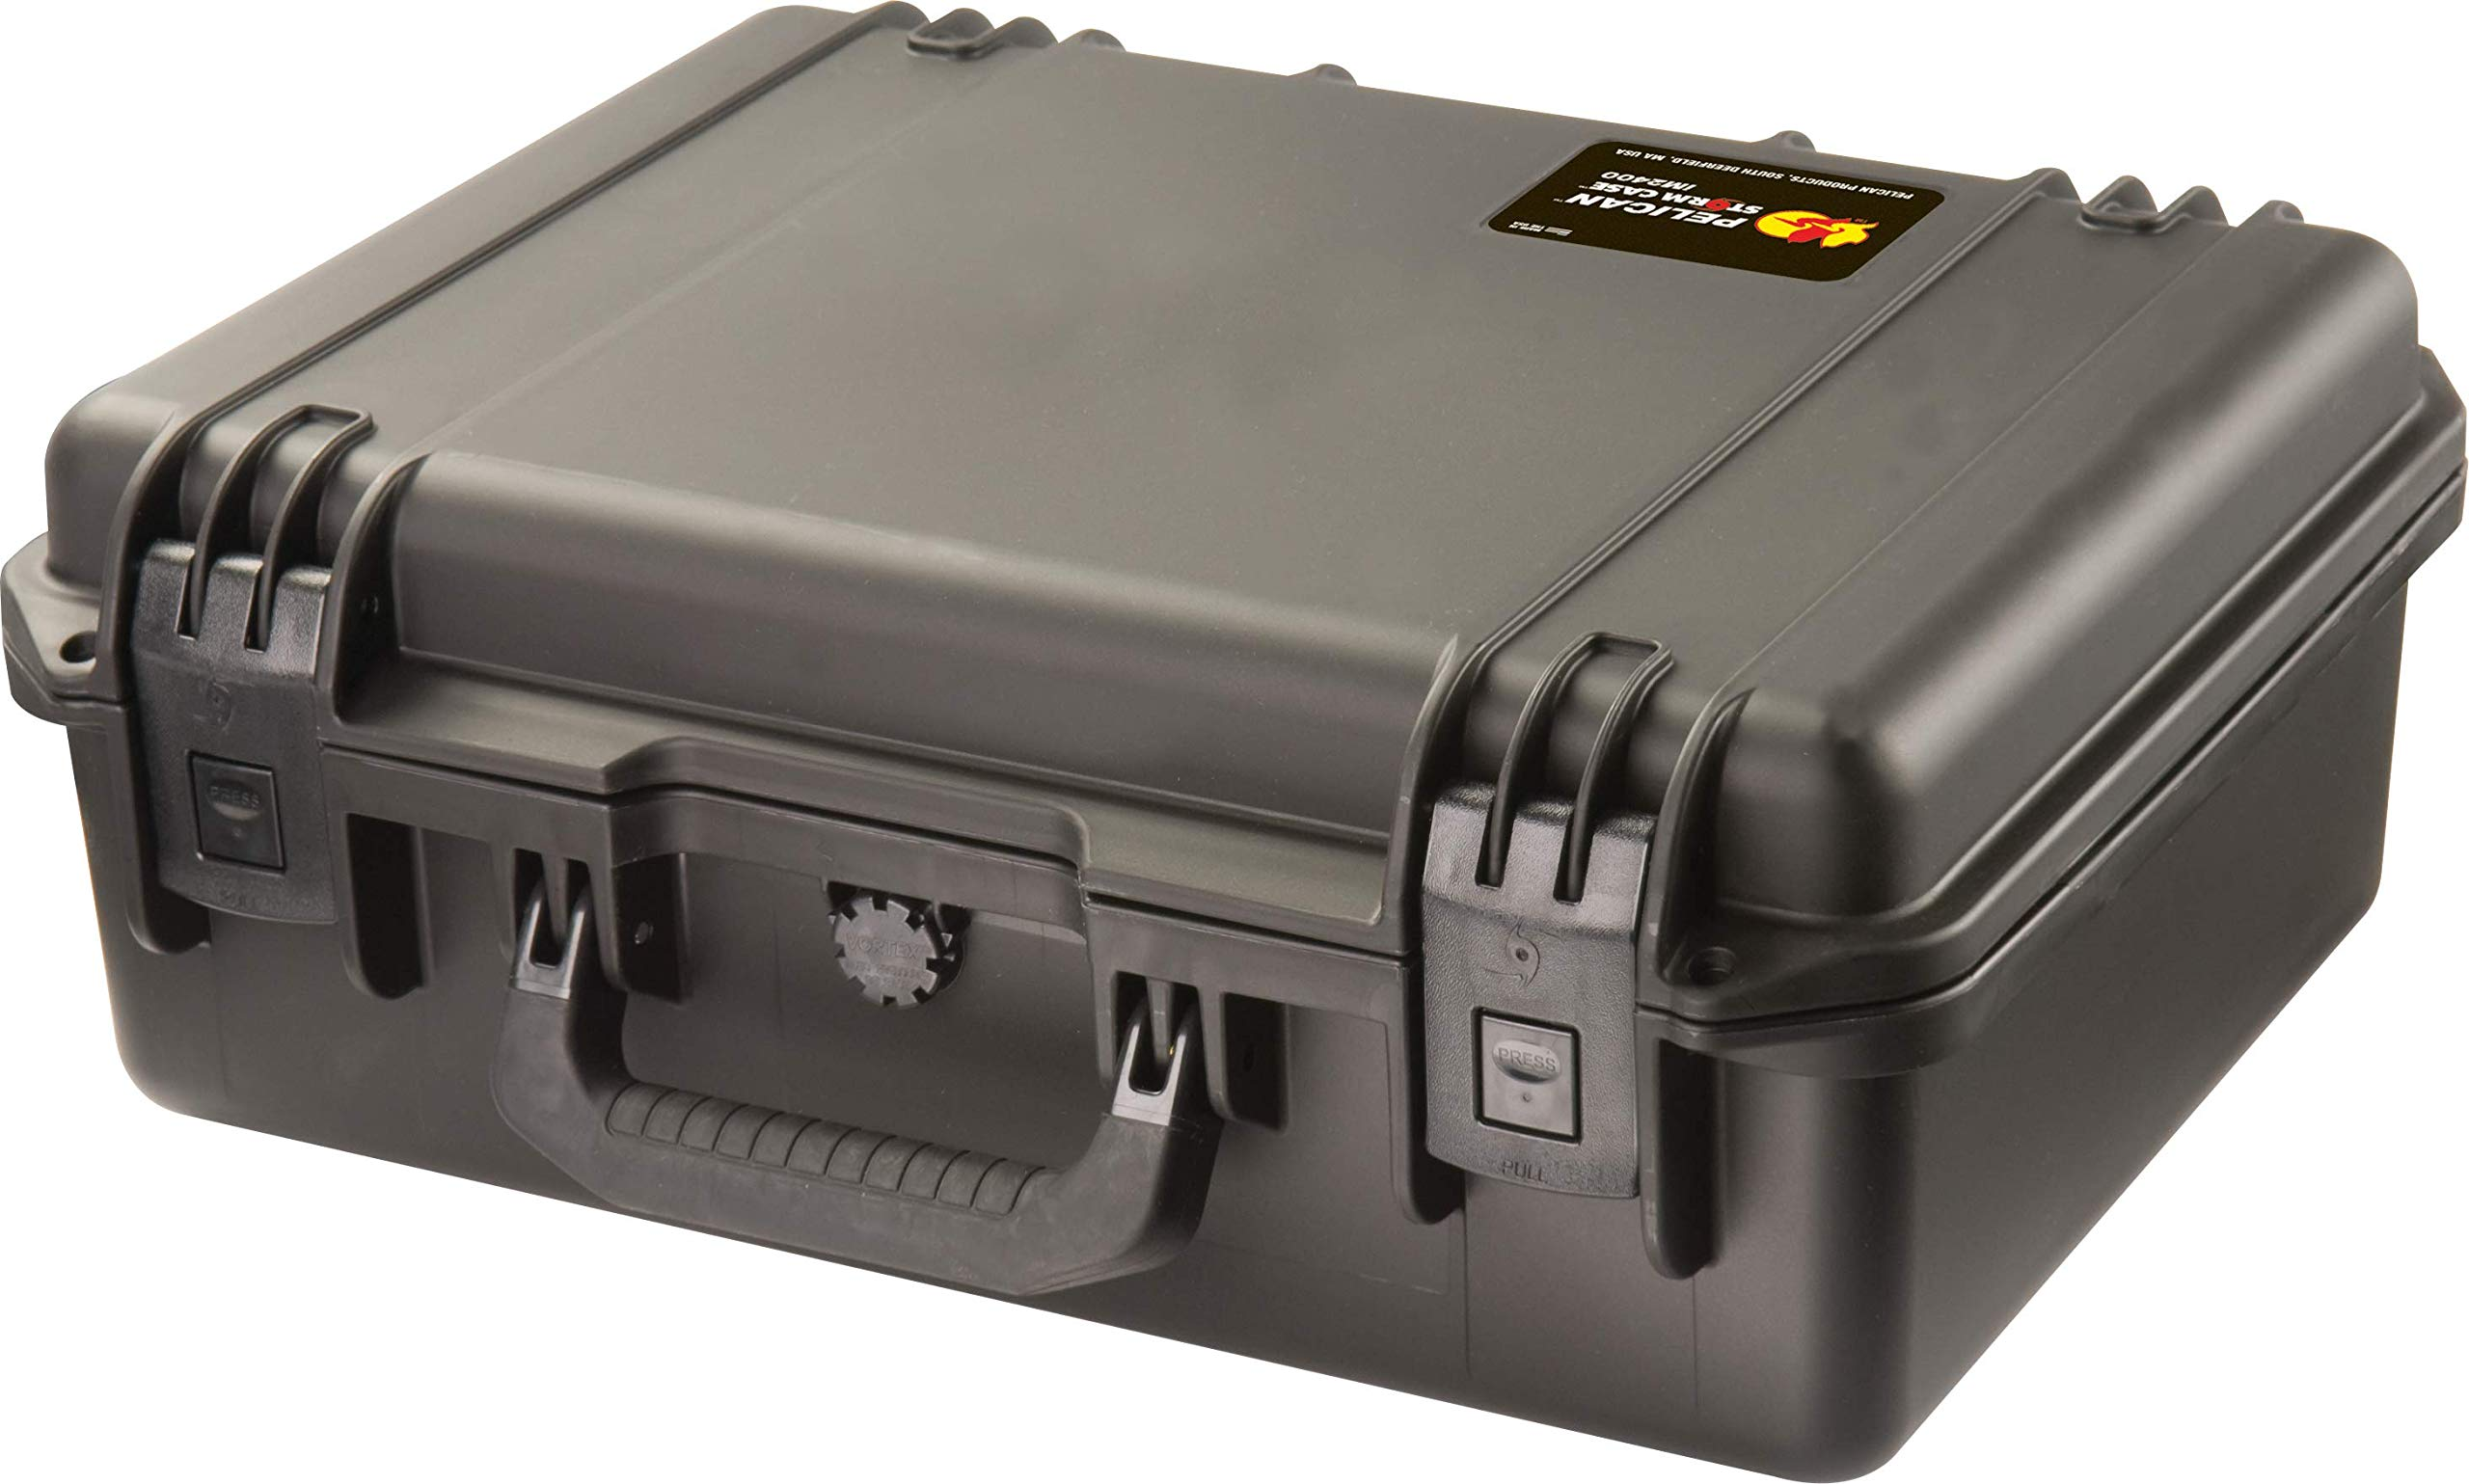 Waterproof Case (Dry Box) | Pelican Storm iM2400 Case With Foam (Black)